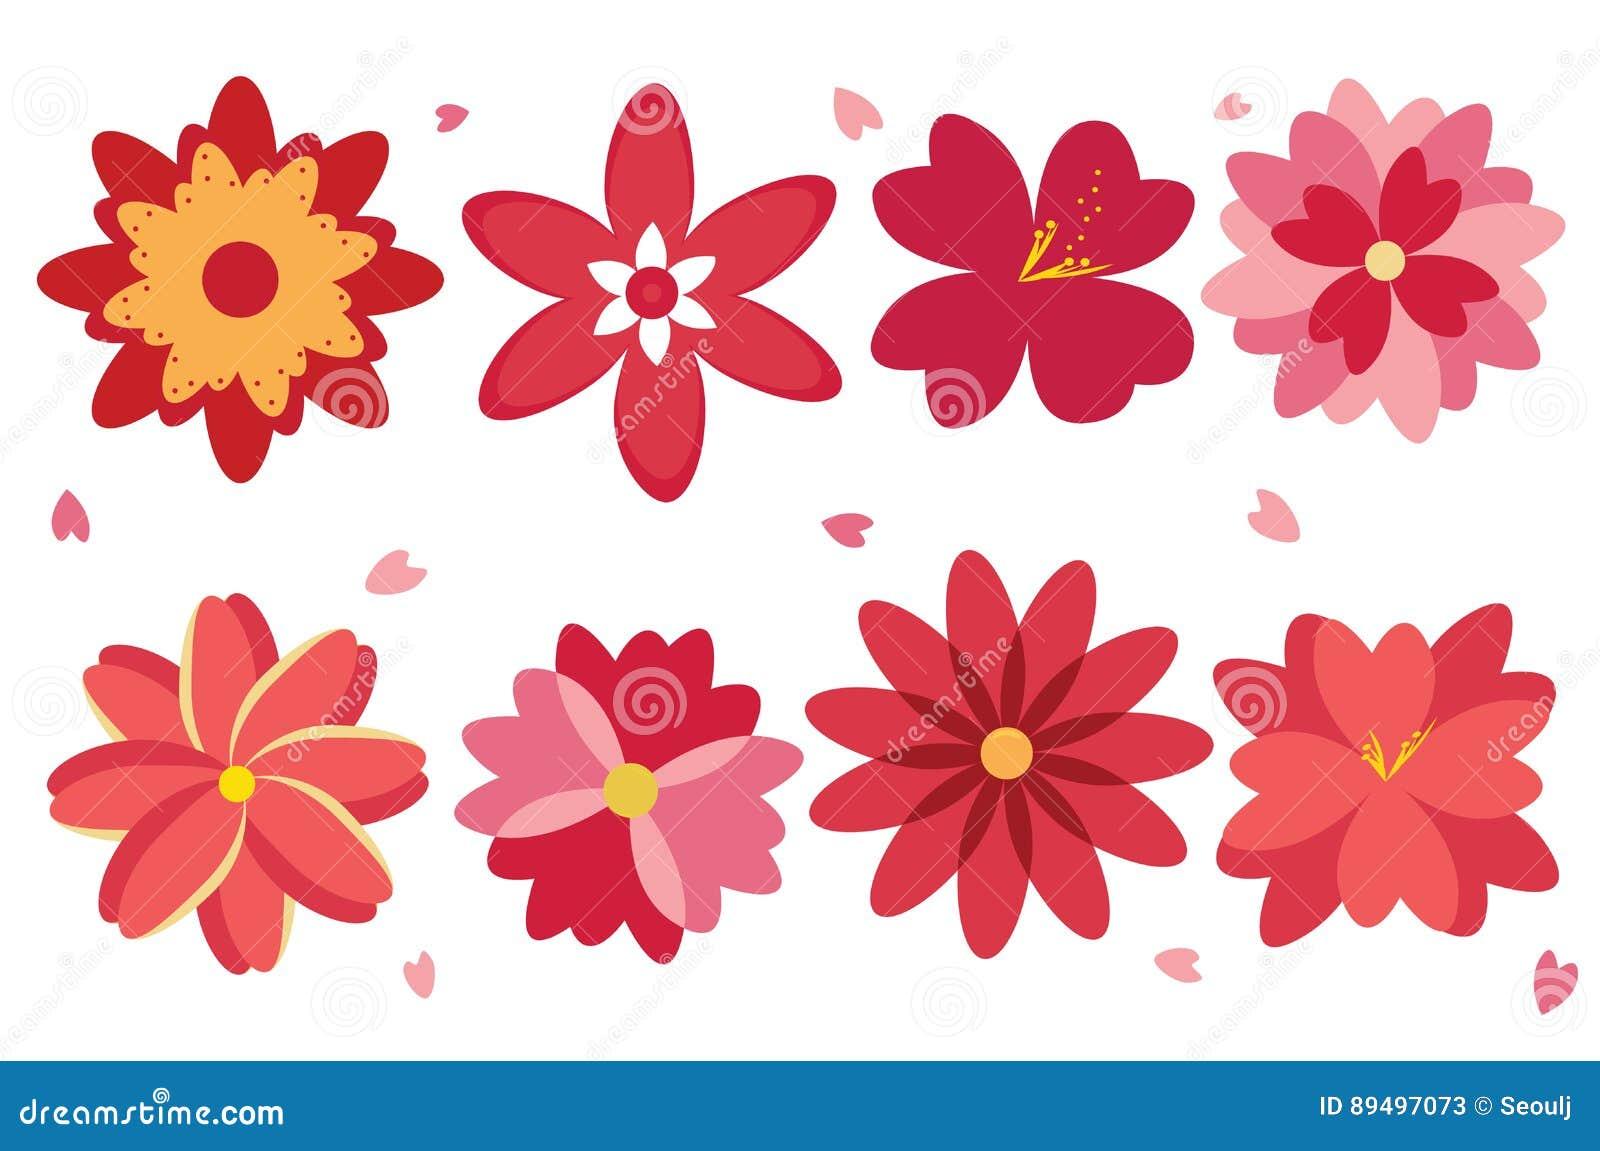 Fancy Flowers Clipart EPS Vector Stock Vector - Illustration of